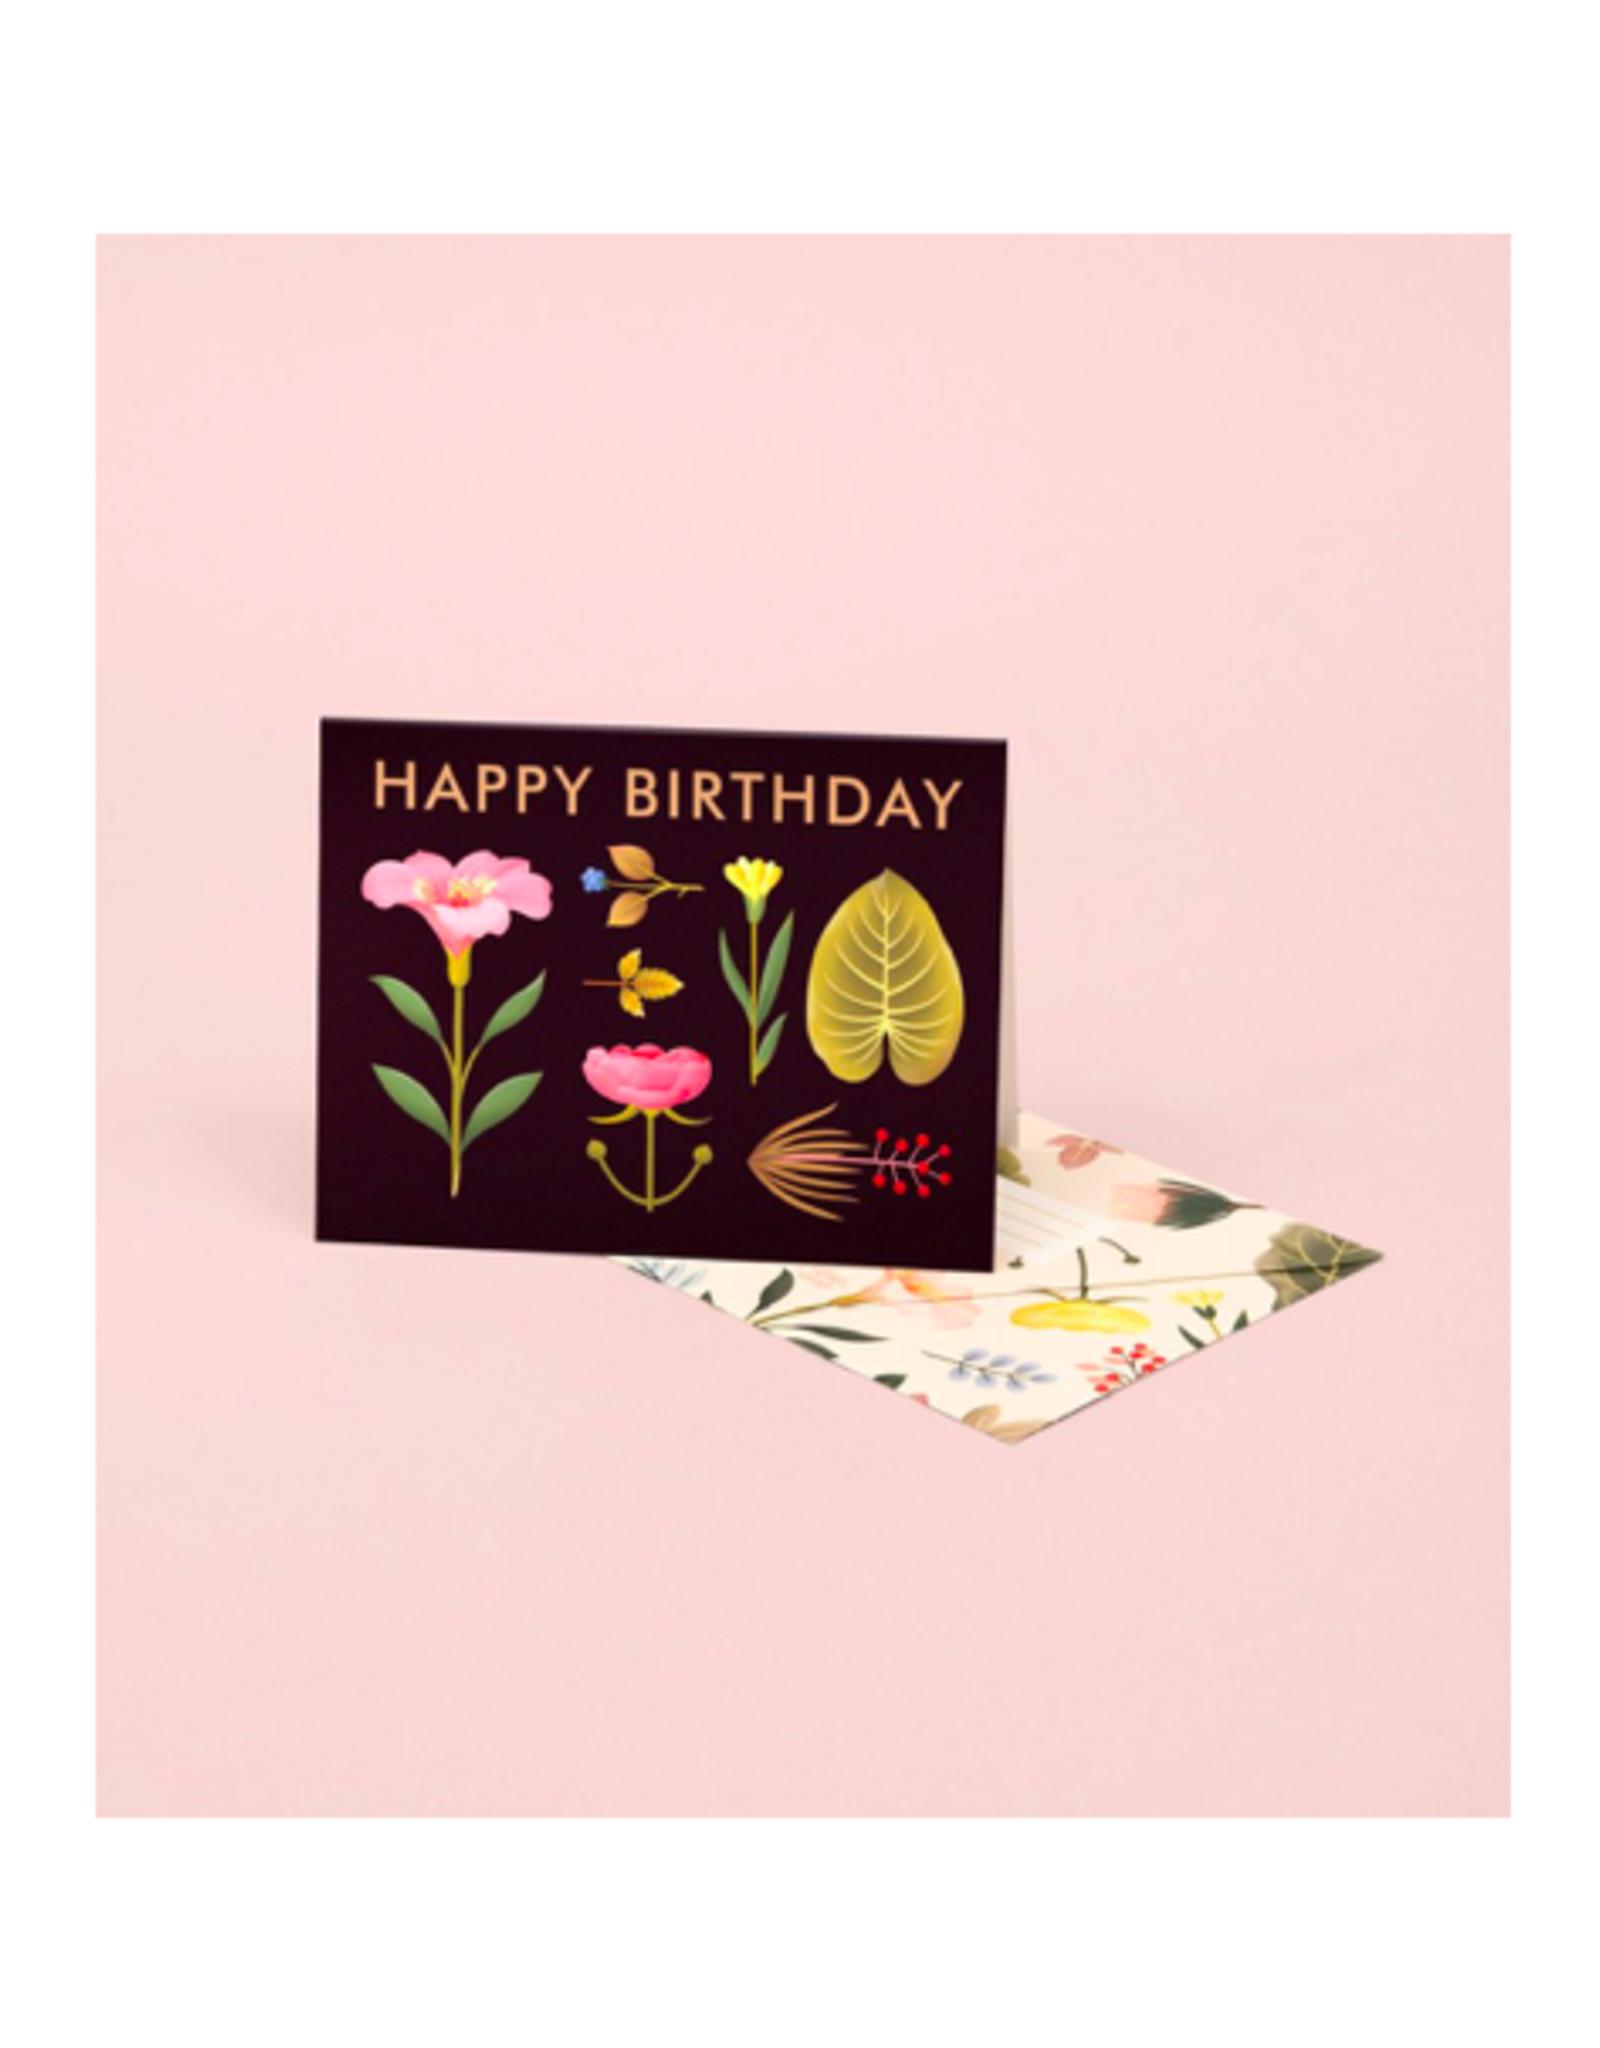 "CAP - Card/Lush Growth, Birthday, 4.25 x 5.5"""